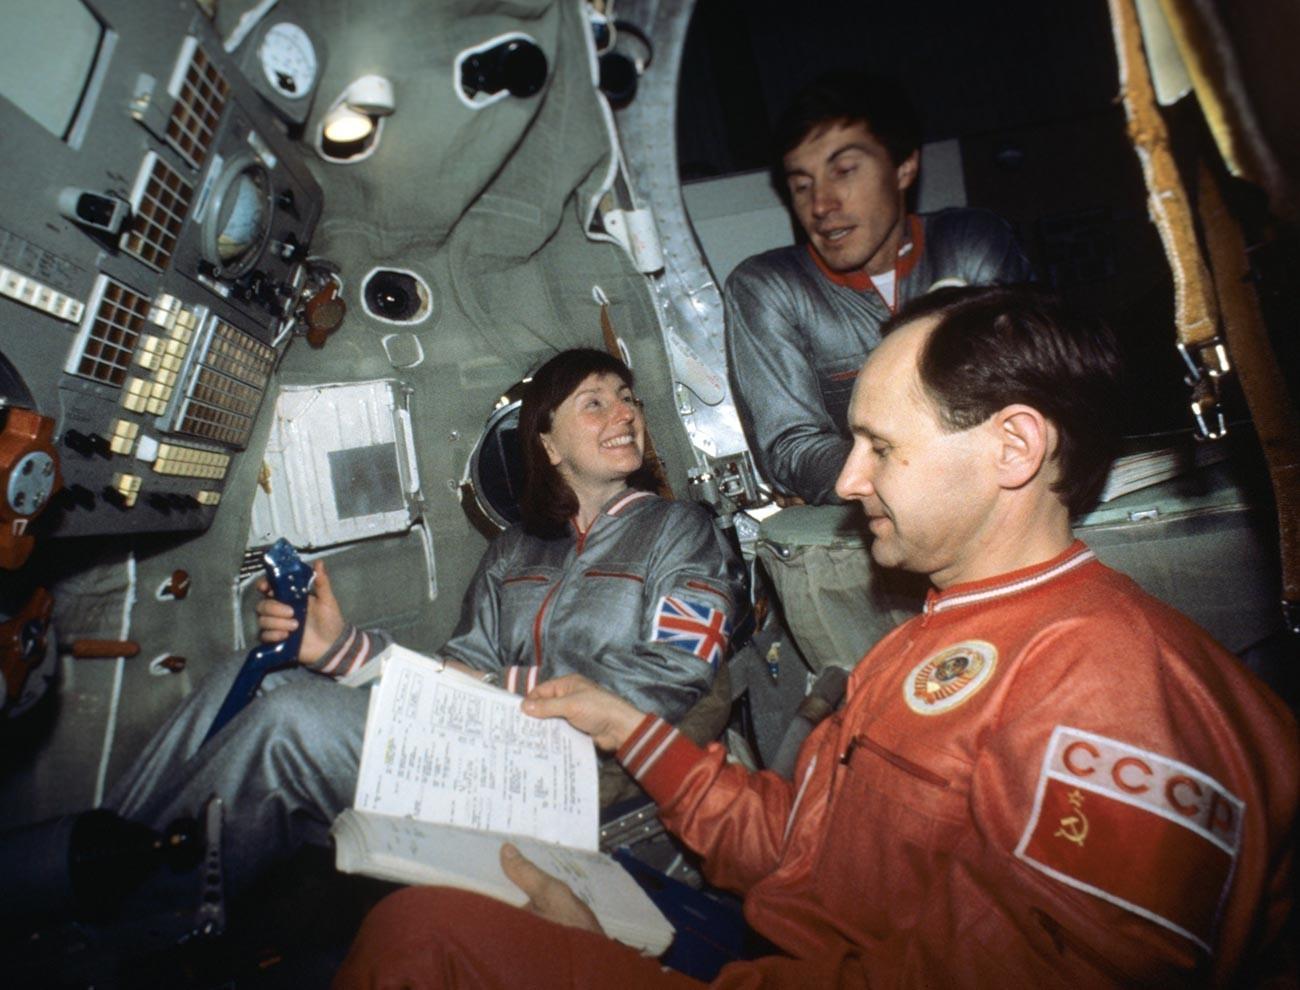 Tripulação espacial soviético-britânica: Helen Sharman, Serguei Krikalev e Anatoli Artsebarski